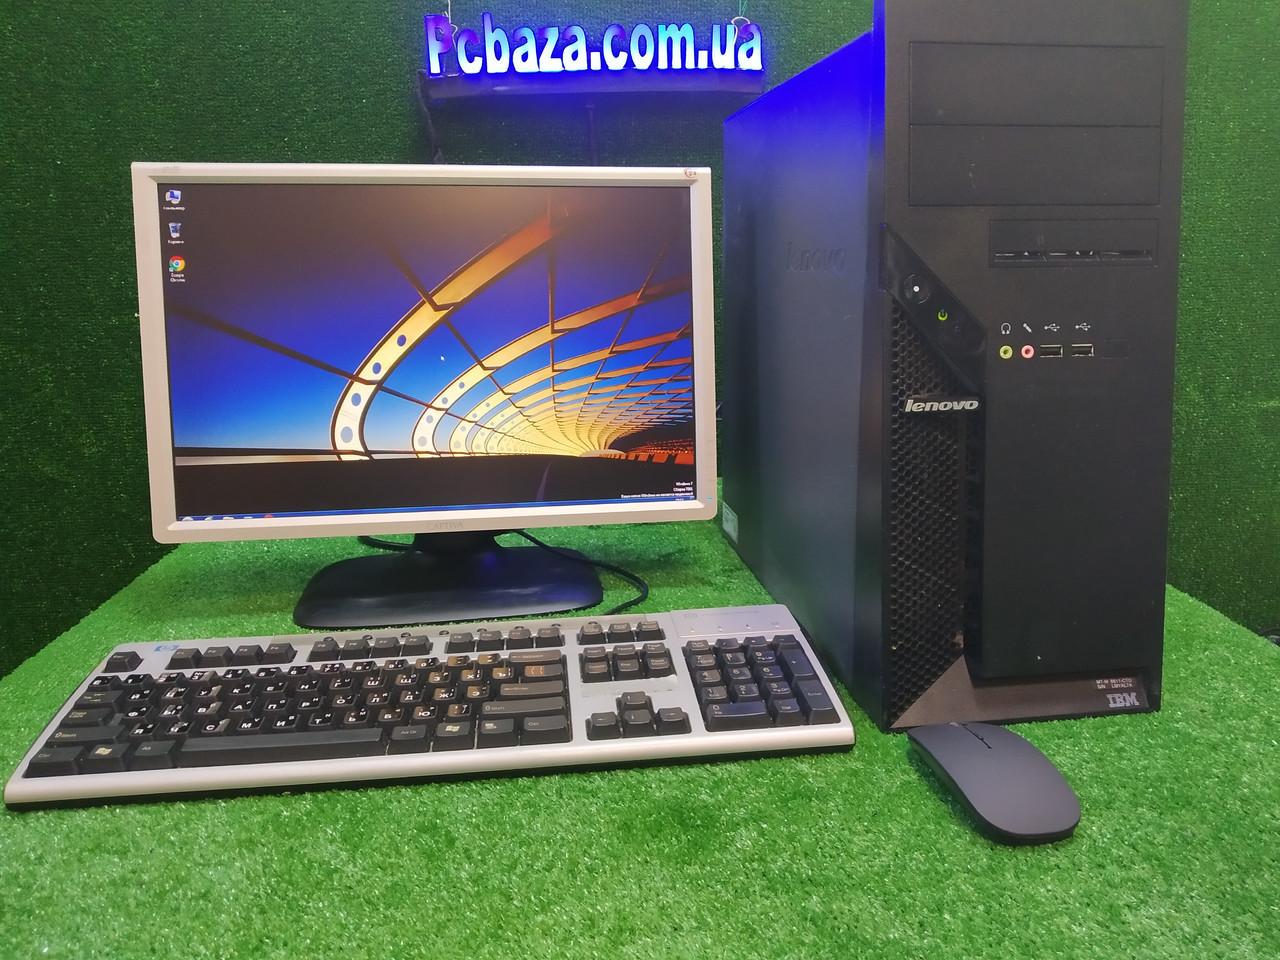 "Комплект Lenovo M55, 2 ядра, 4 ГБ ОЗУ, 320 Гб HDD + монитор 19"" Широкий , Полностью настроен!"